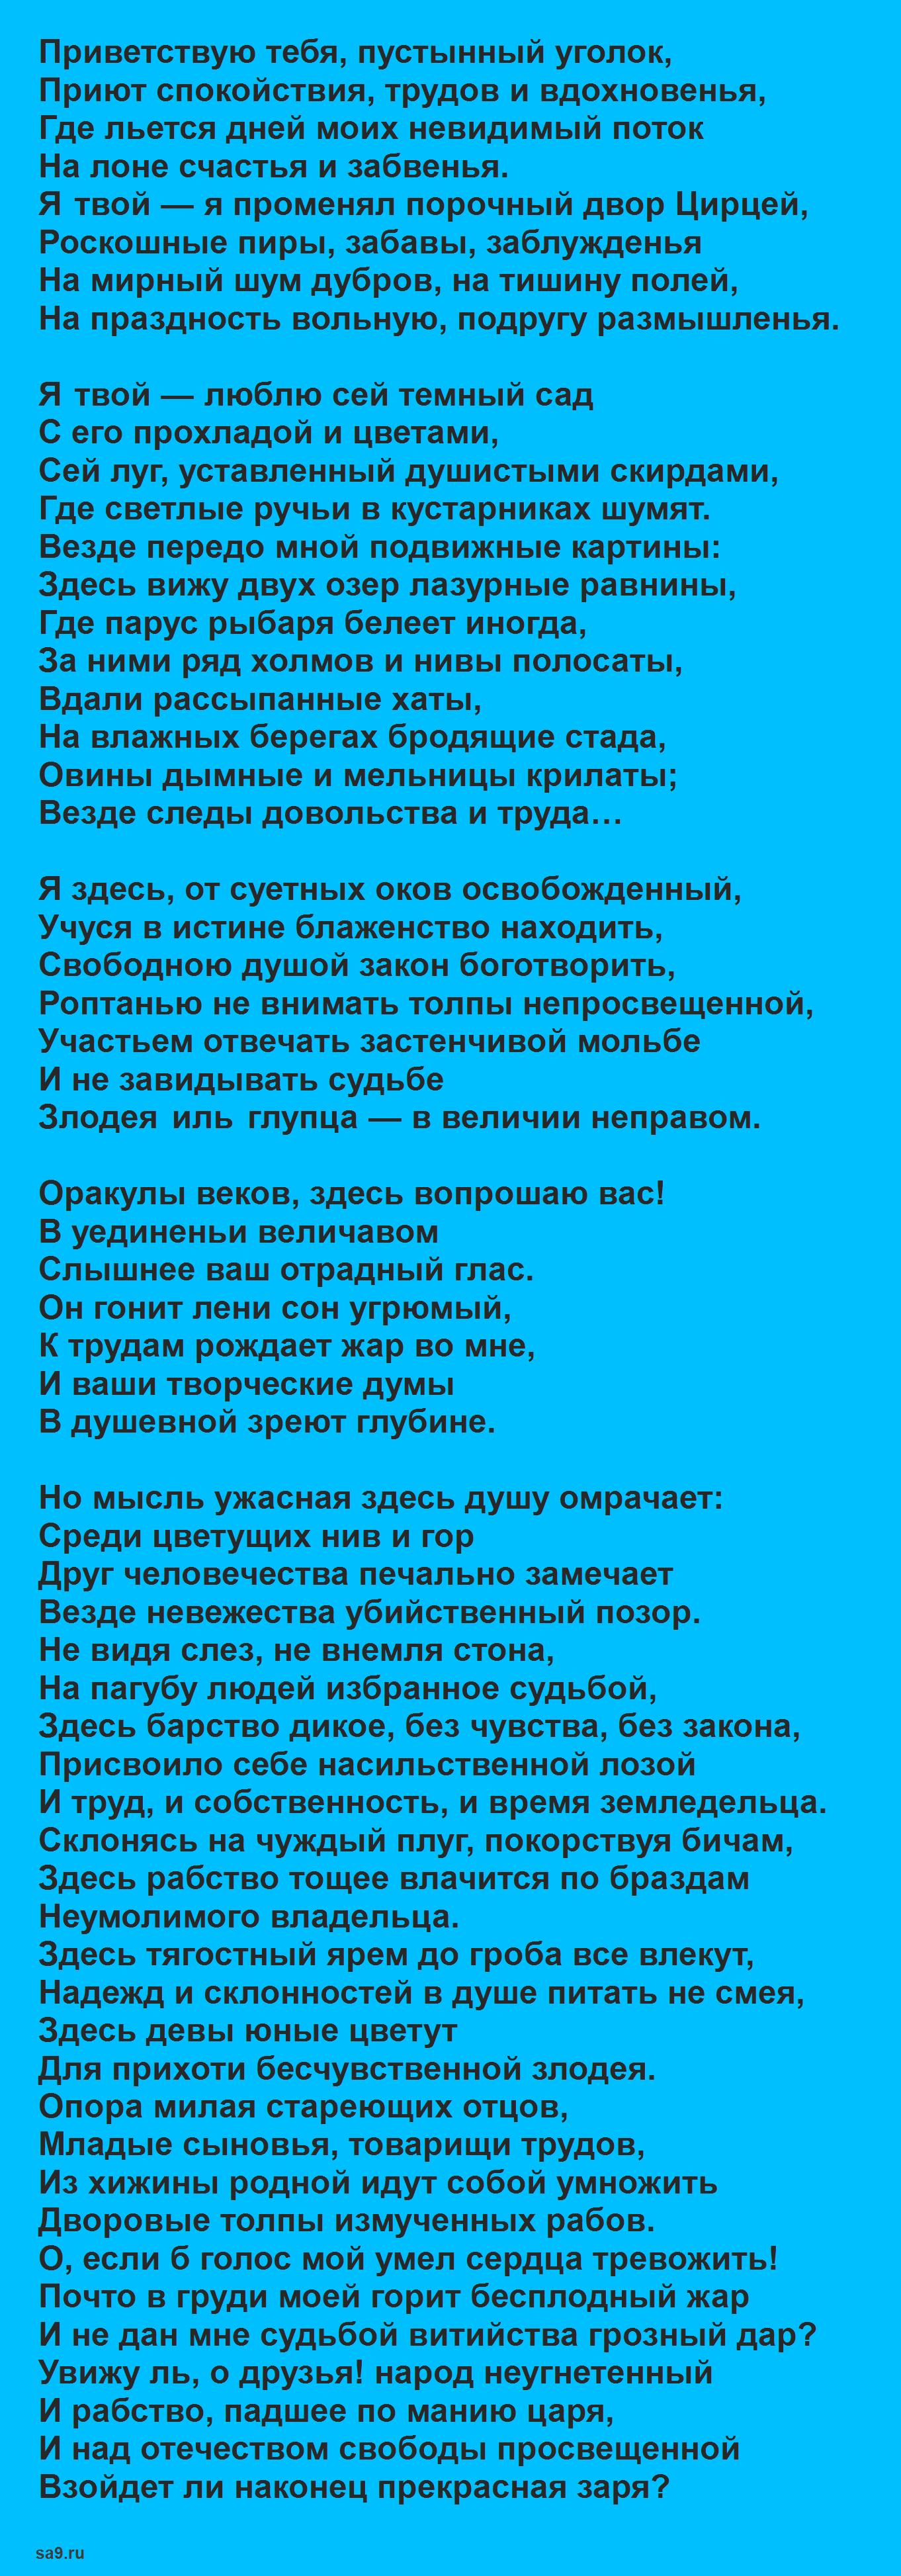 Читать стихи о Родине, Пушкин - Деревня